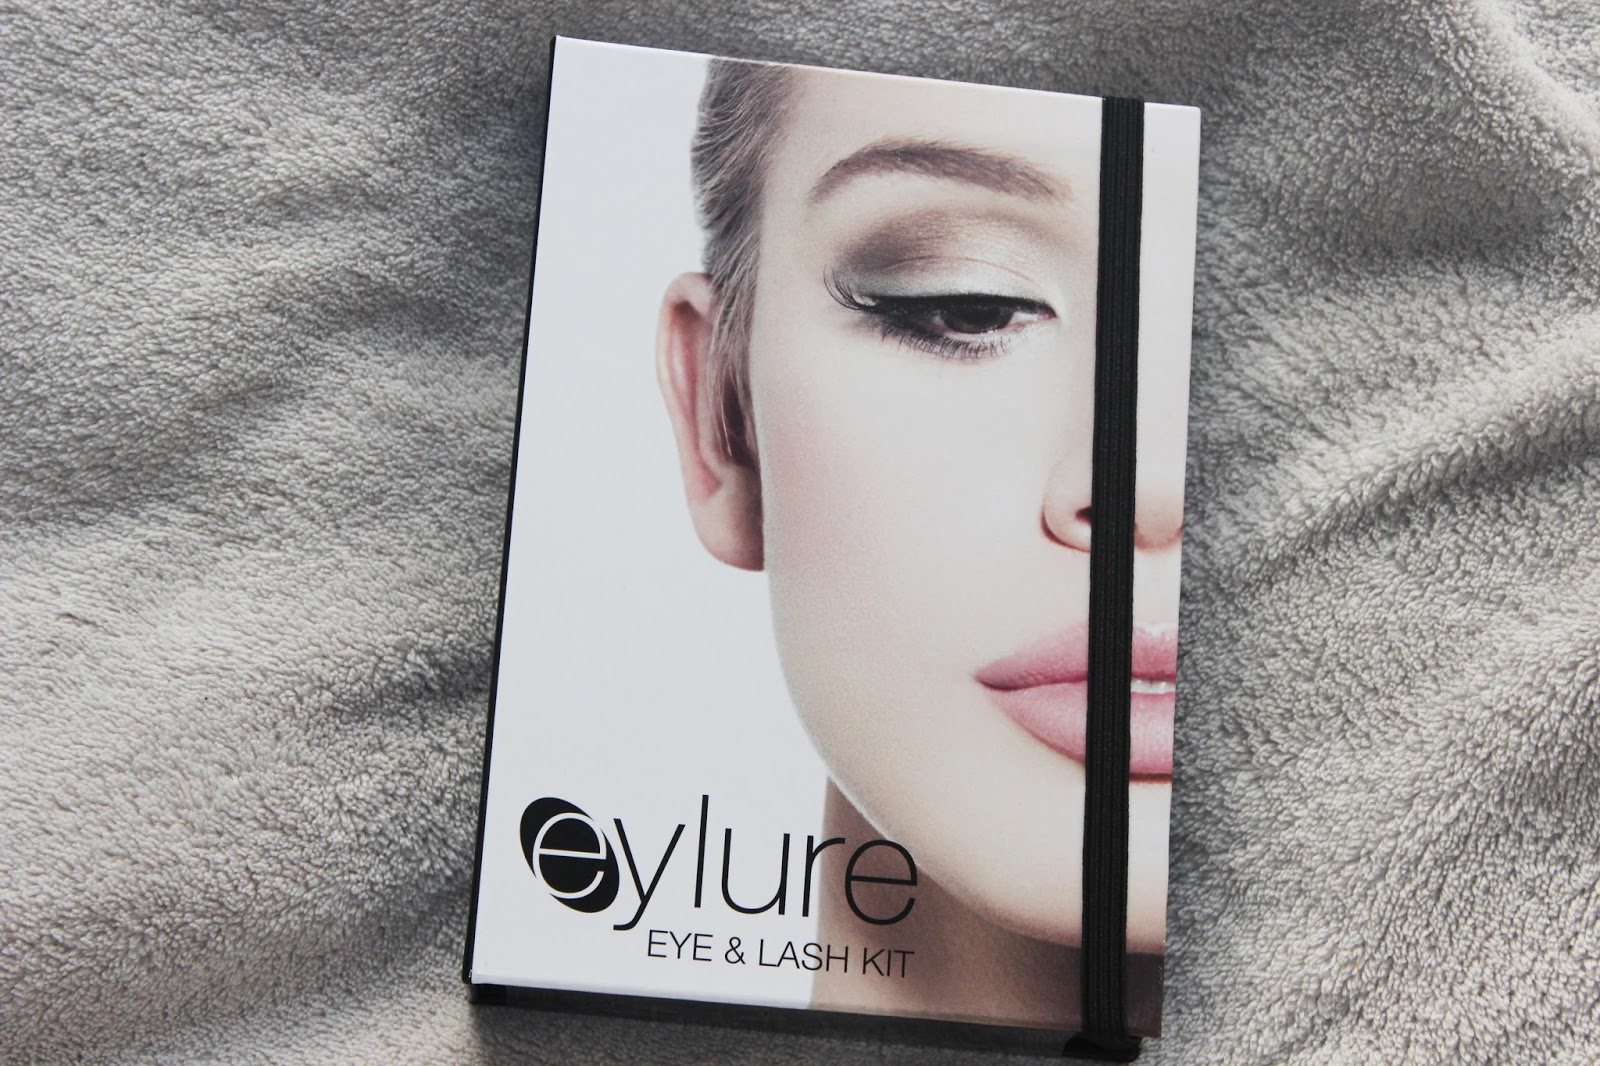 eylure-eye-and-lash-kit